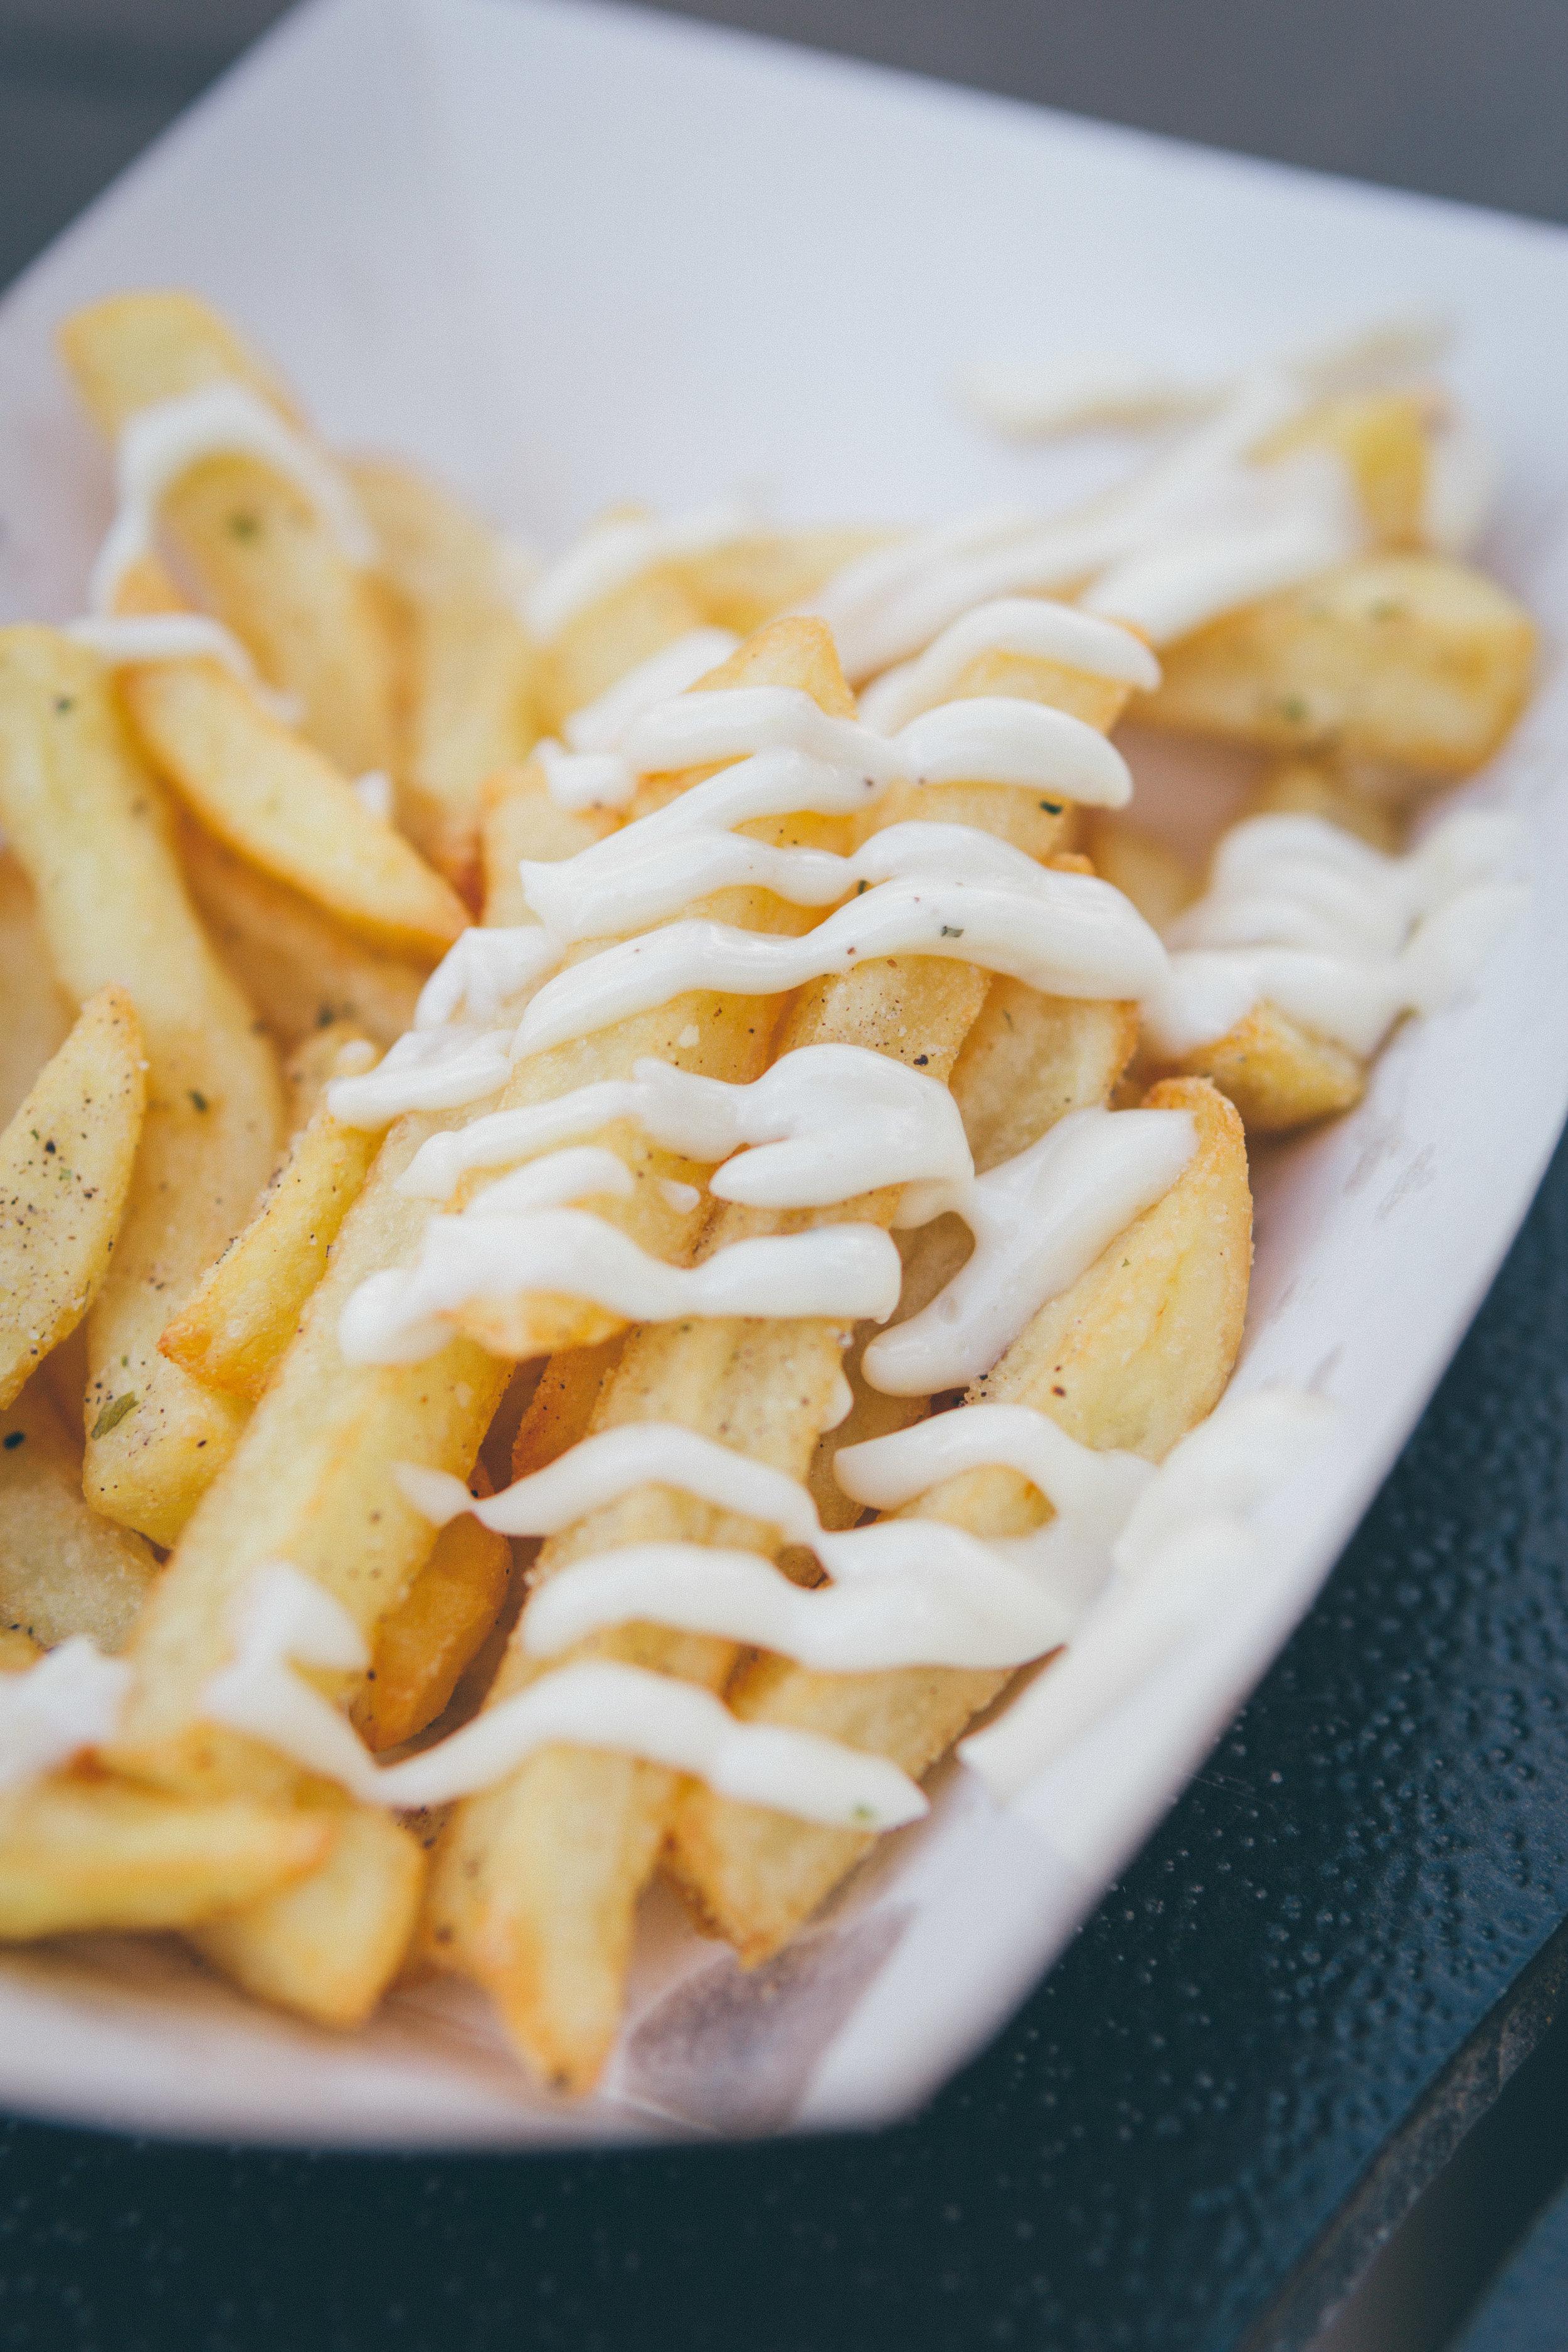 23) Artisan Eats: Duck Fat Truffle Fries with Parmesan Truffle Aioli